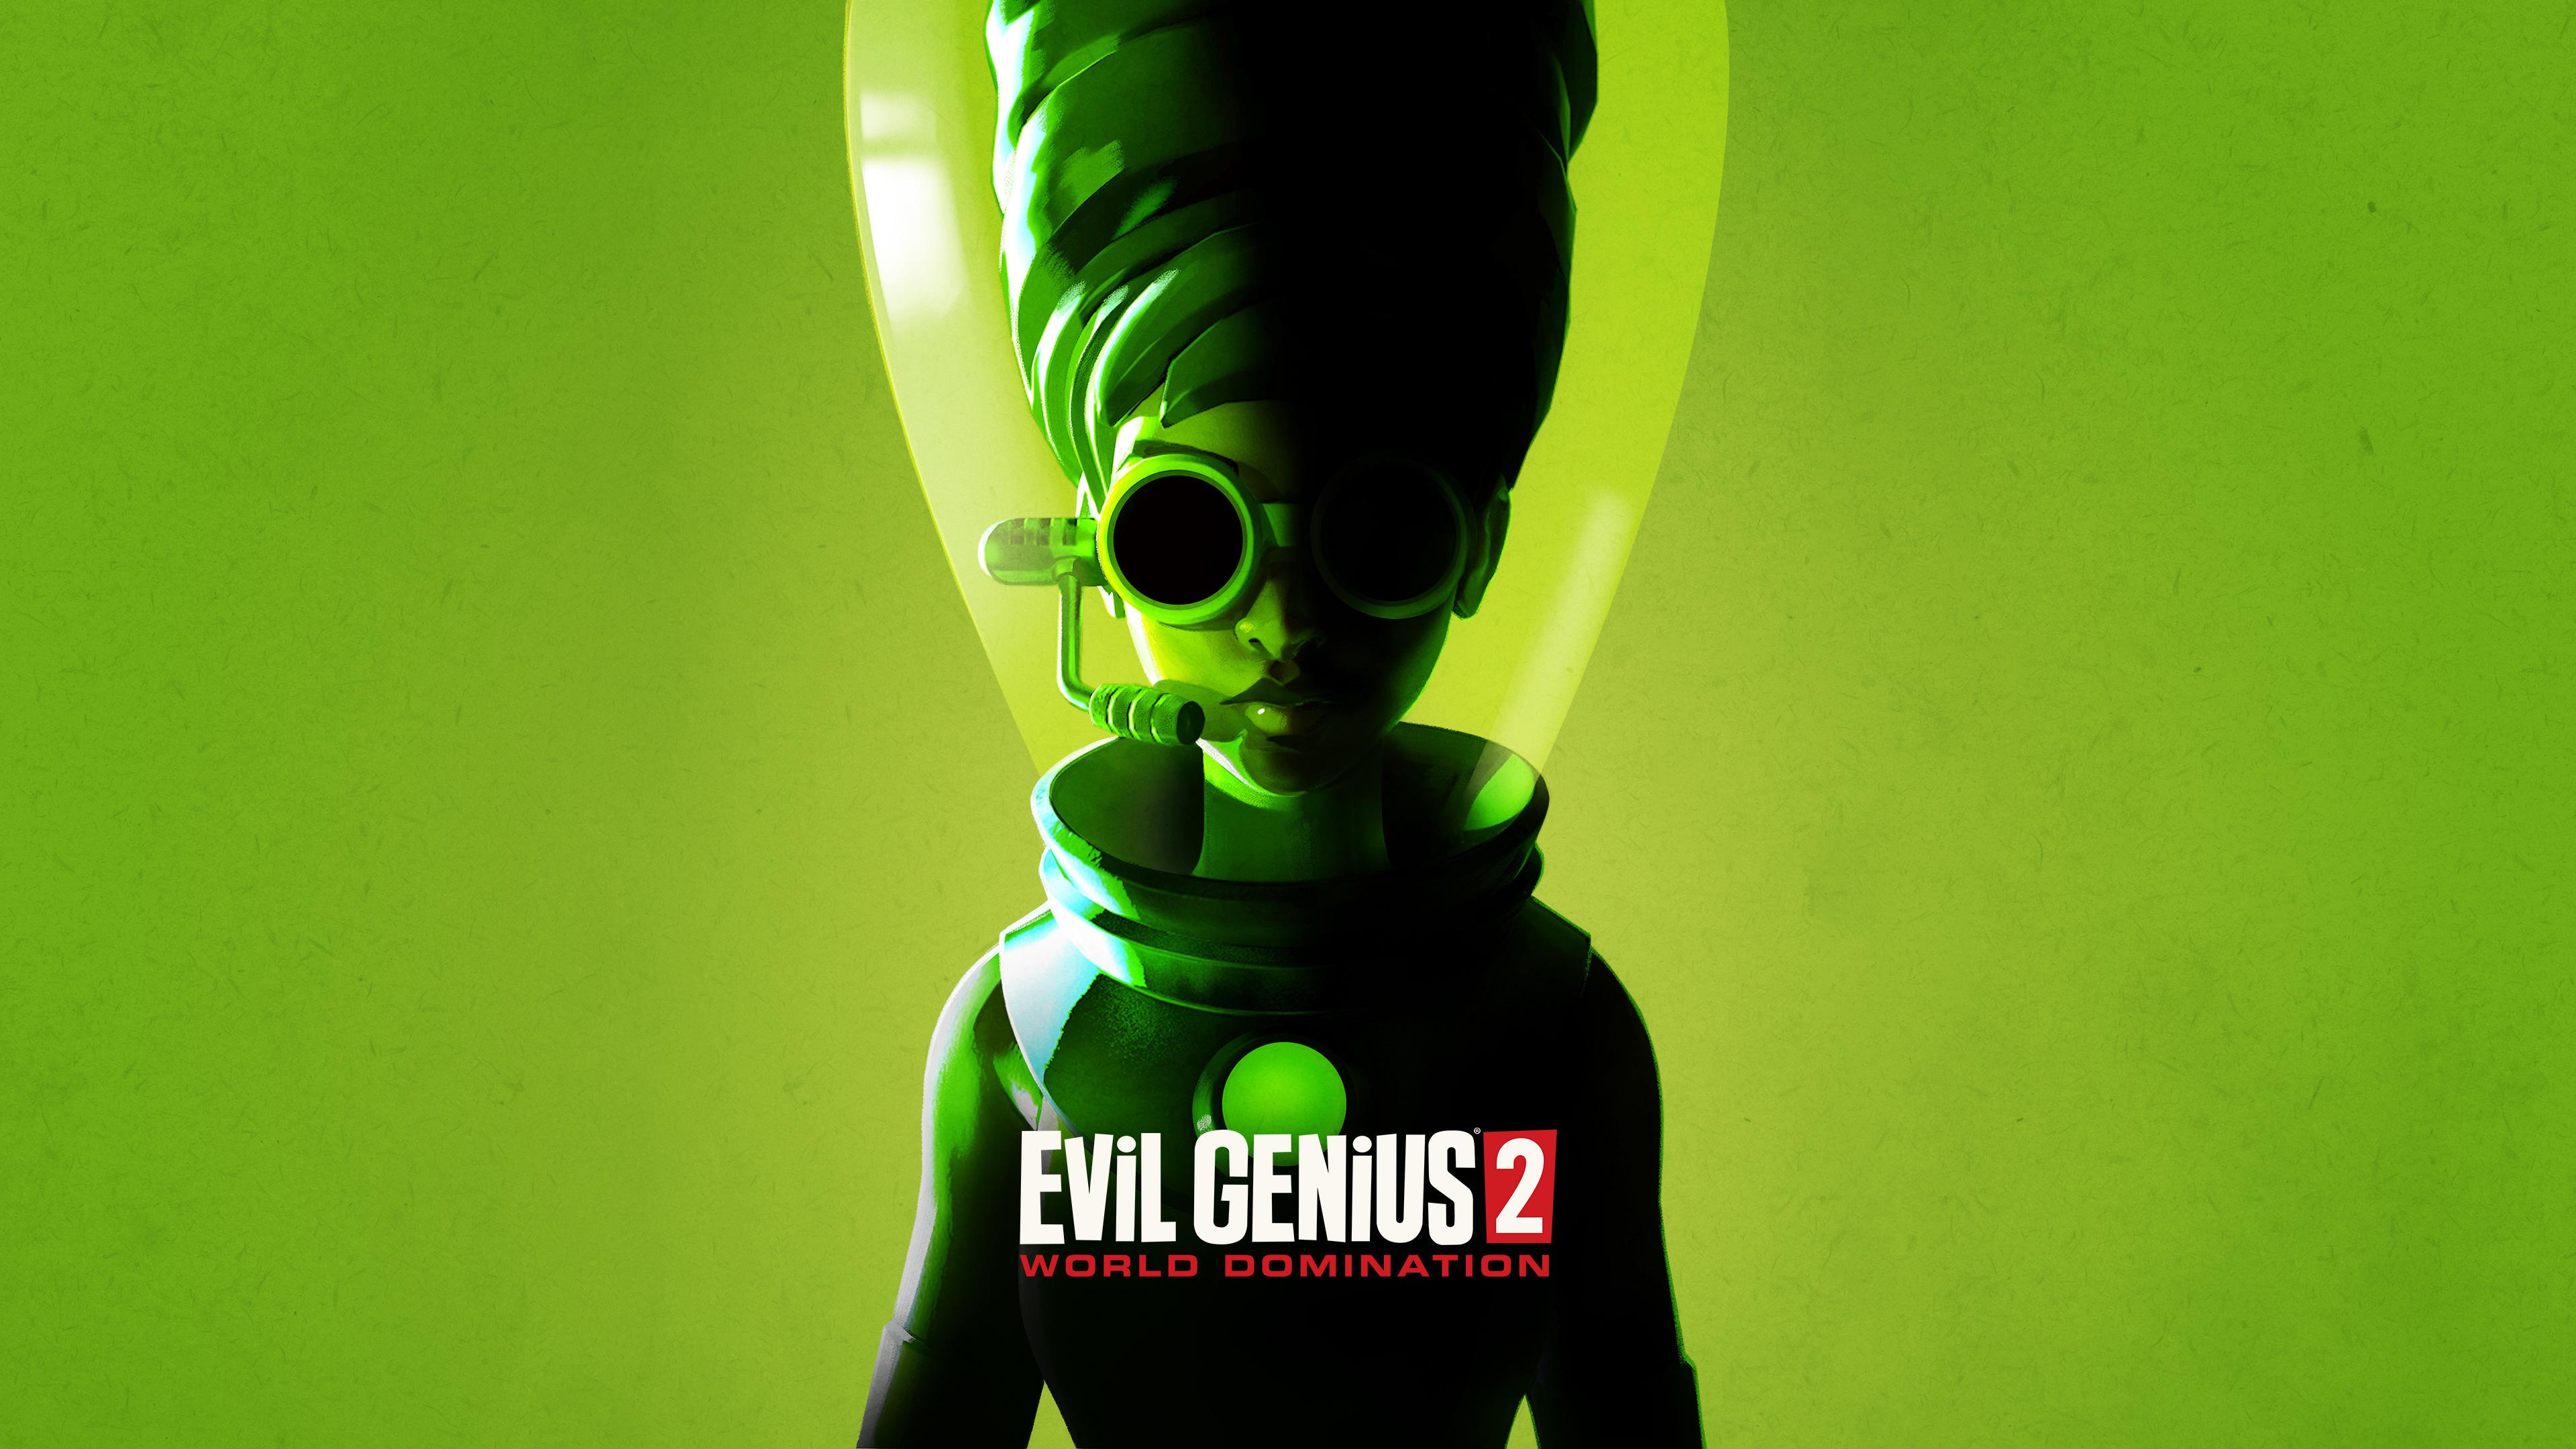 2020 Evil Genius 2 World Domination Wallpaper HD Games 4K 3840x2160